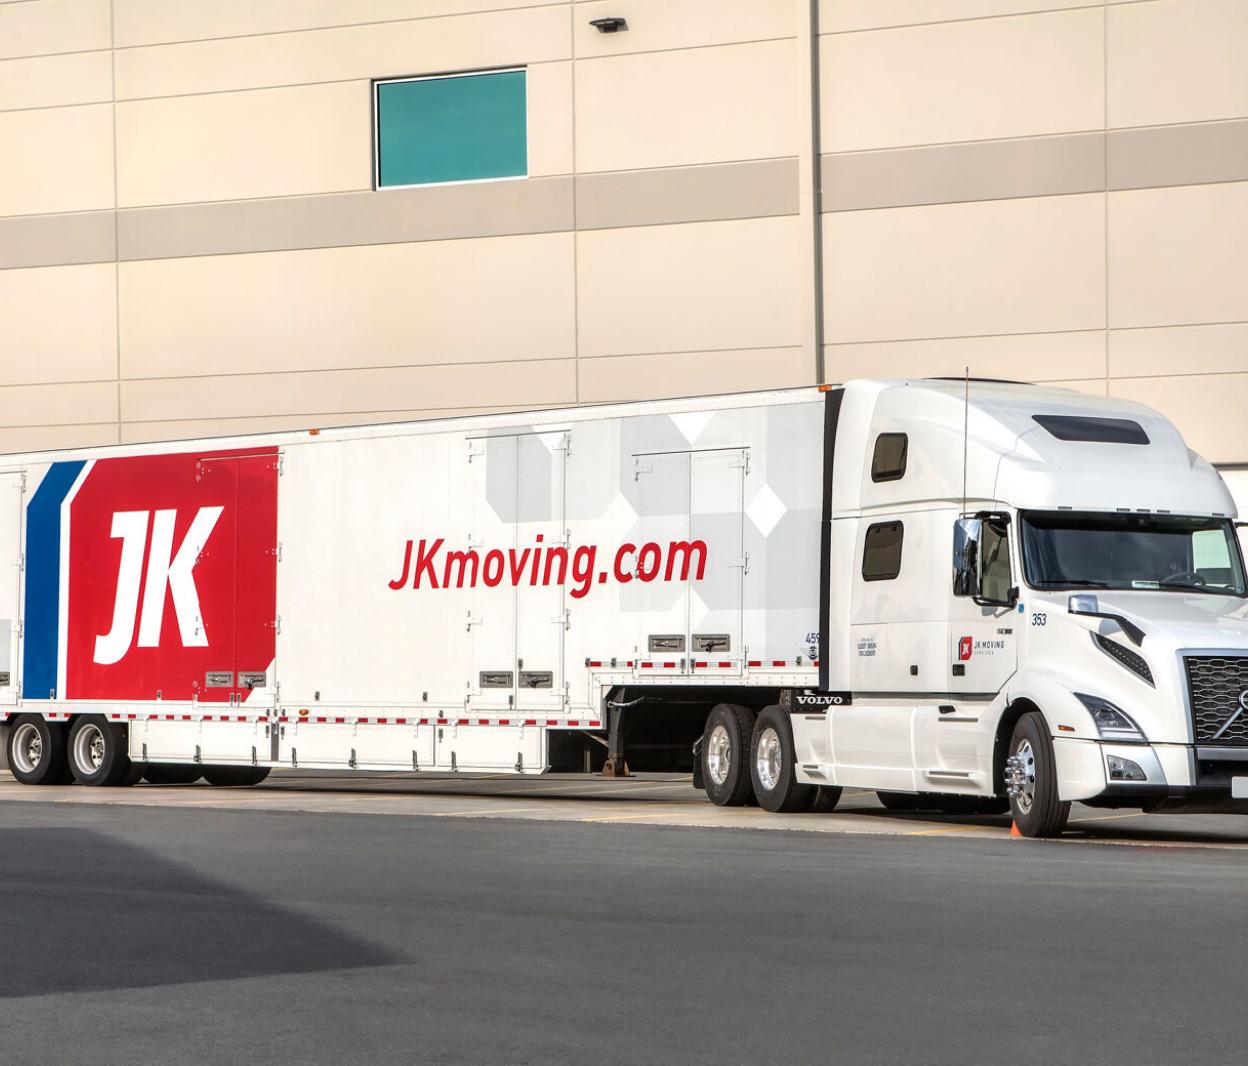 JK Moving truck